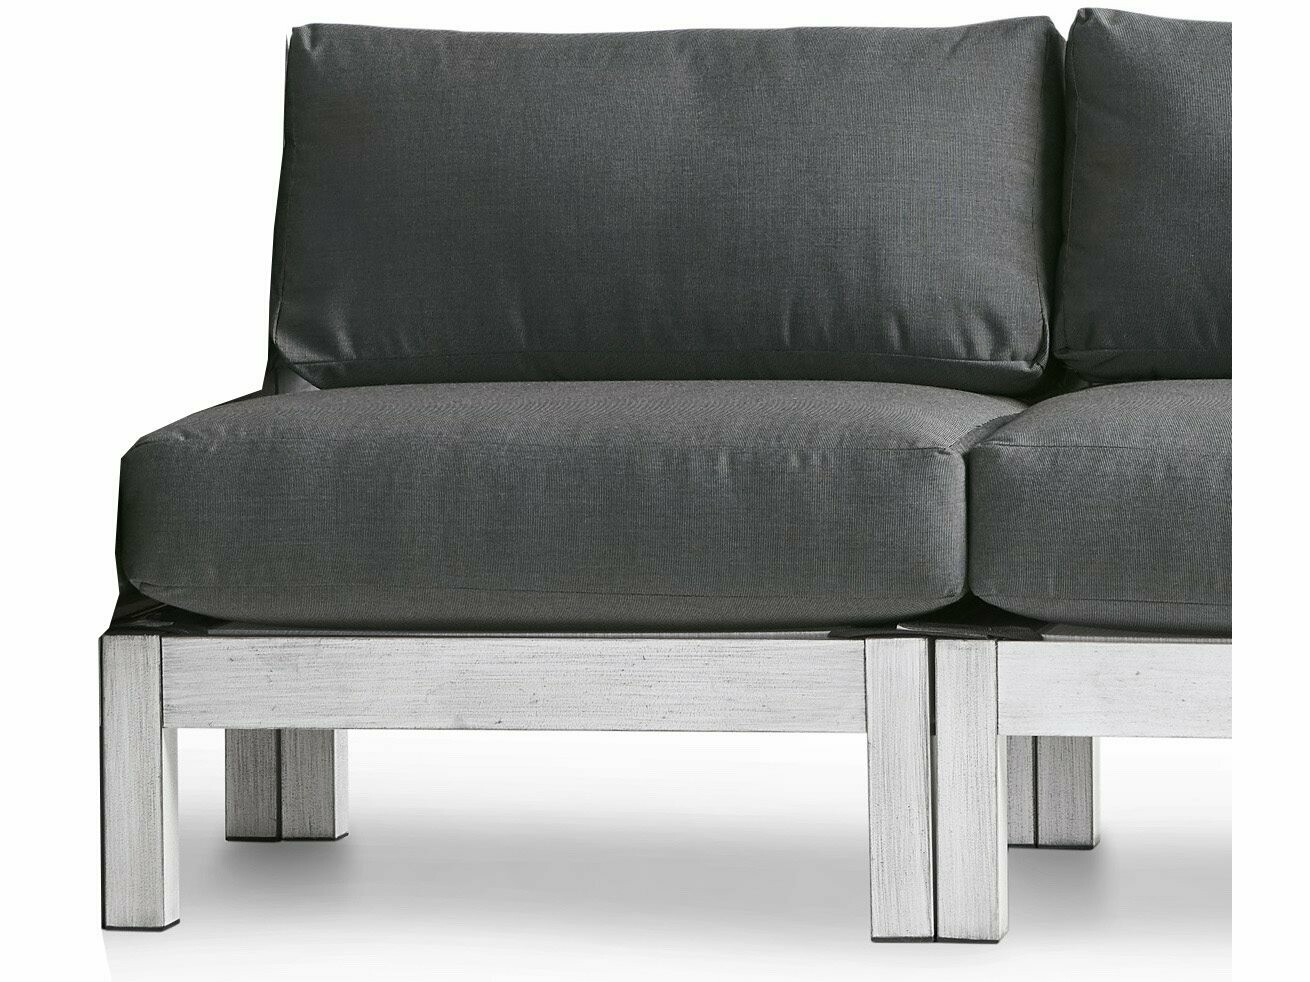 South Sea Rattan Farlowe Aluminum Brushed White Modular Lounge Chair